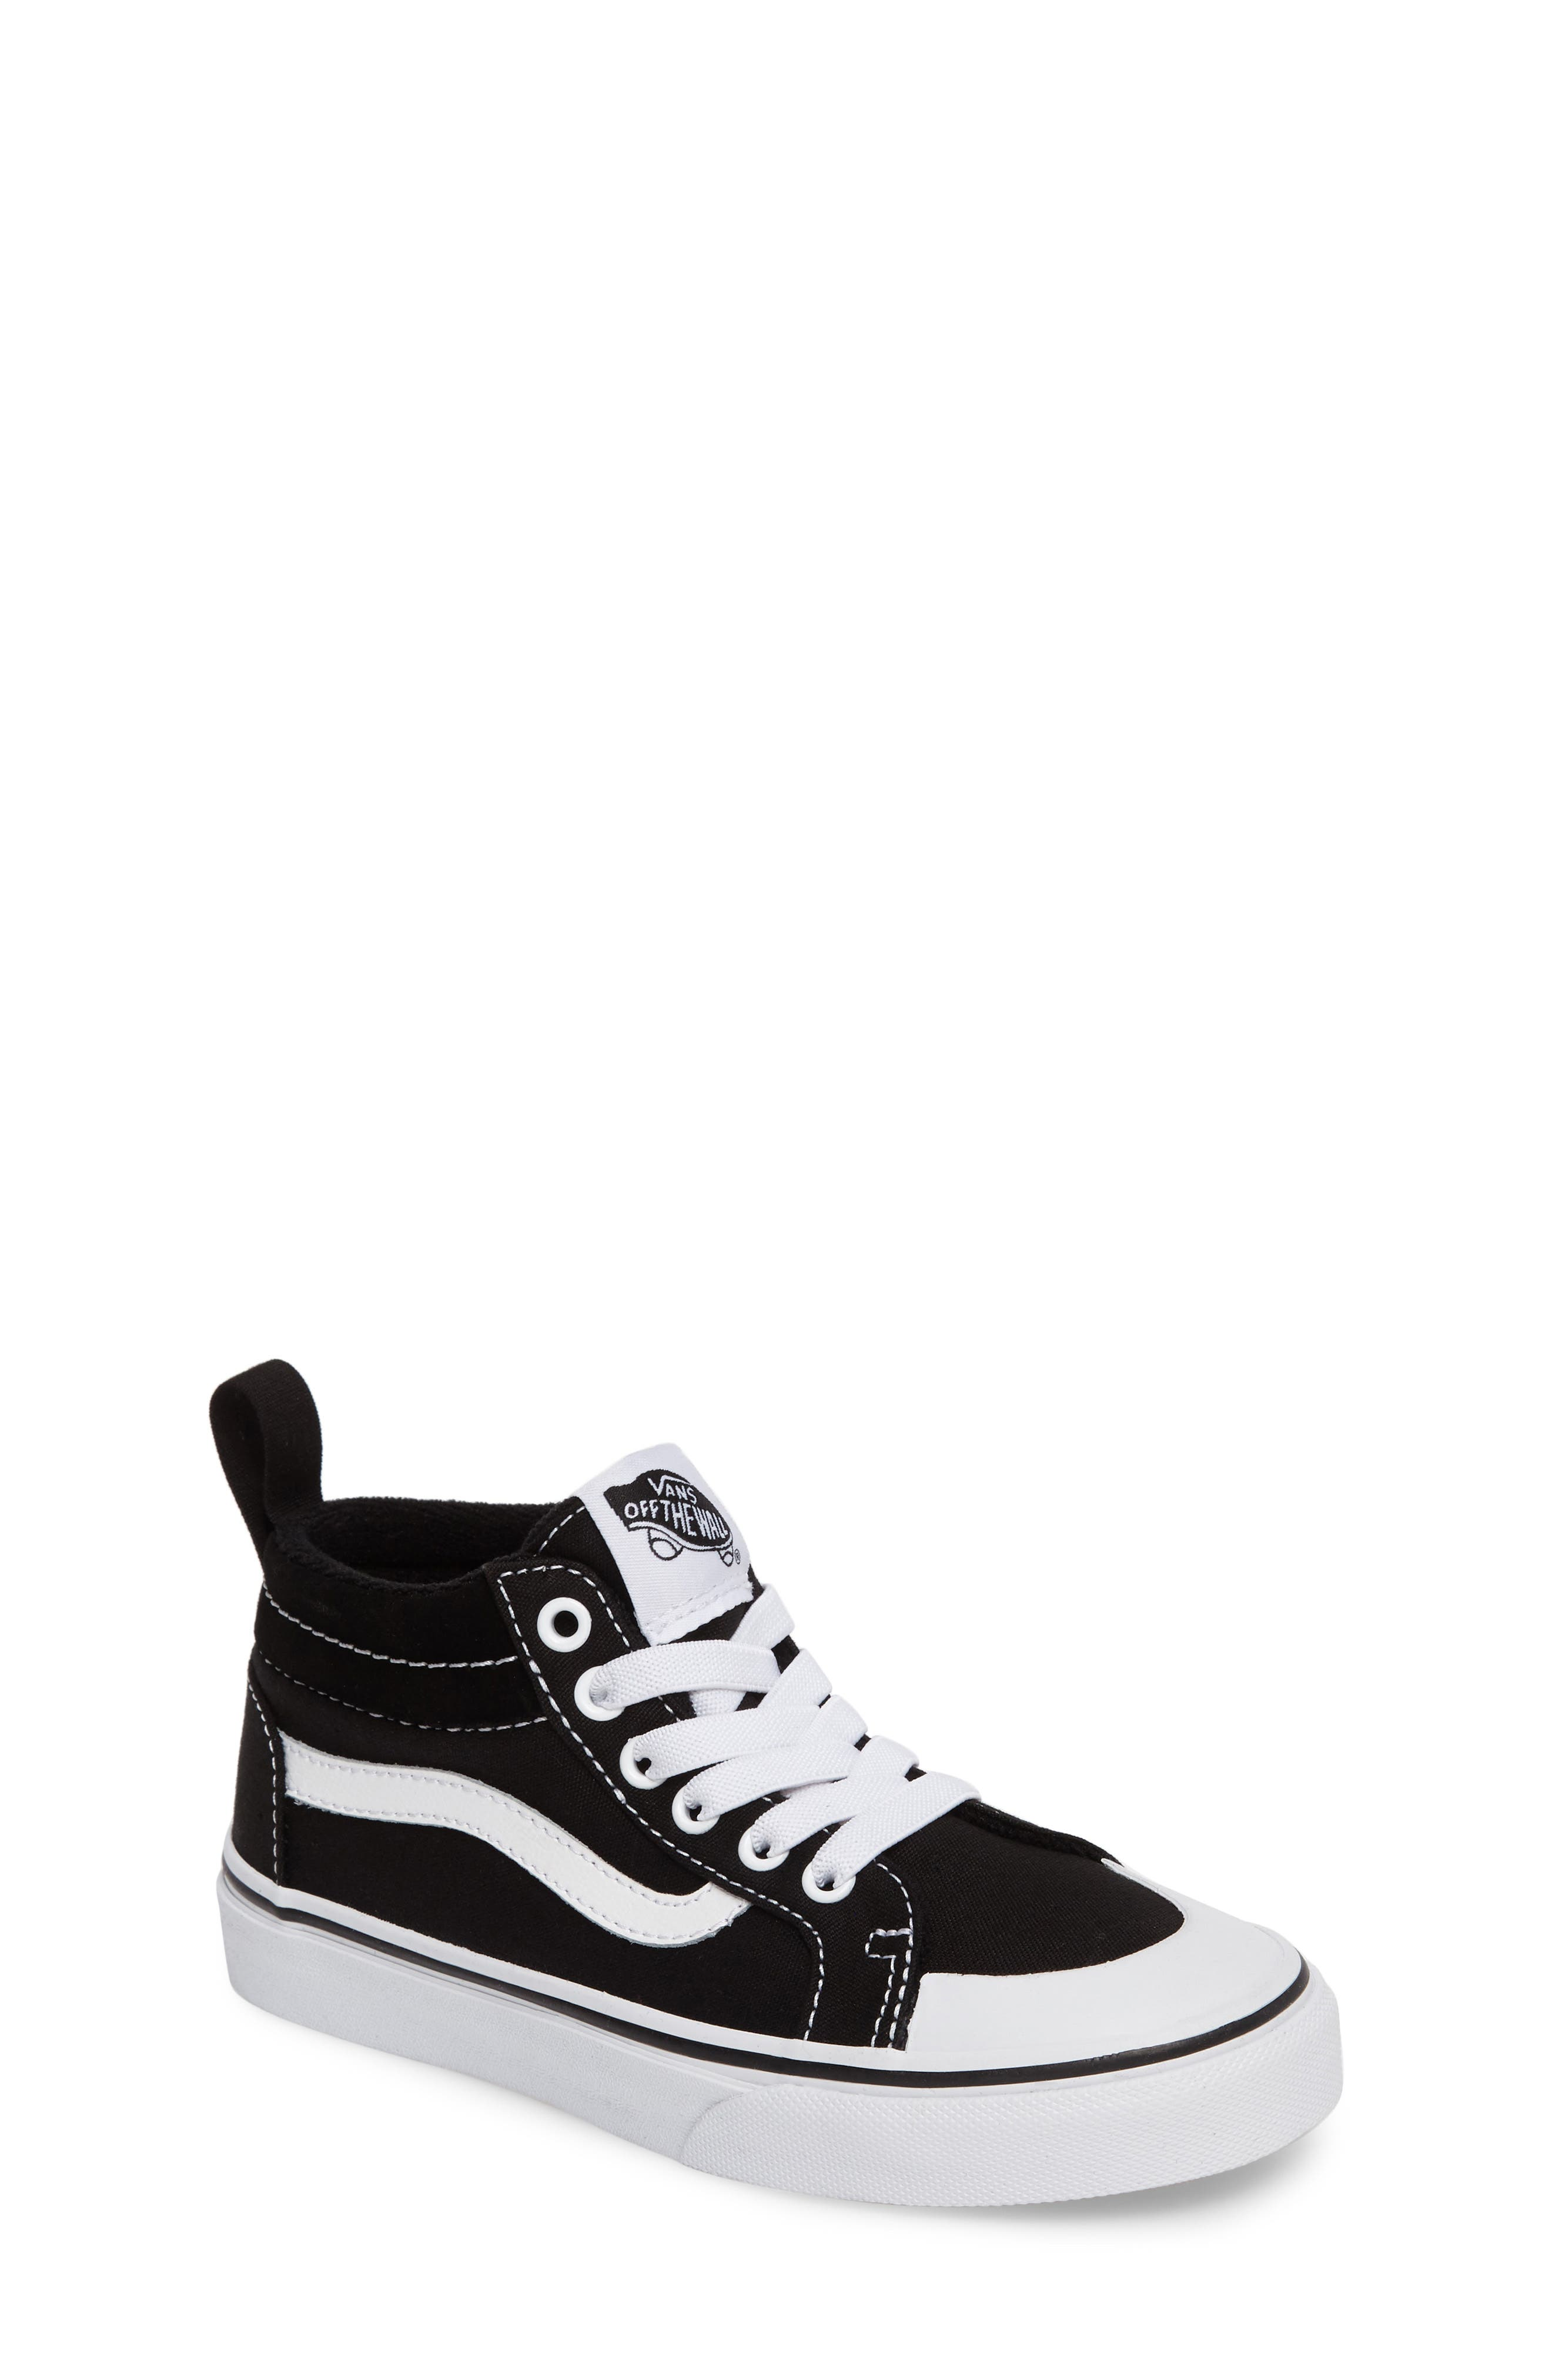 VANS Racer Mid Elastic Lace Sneaker